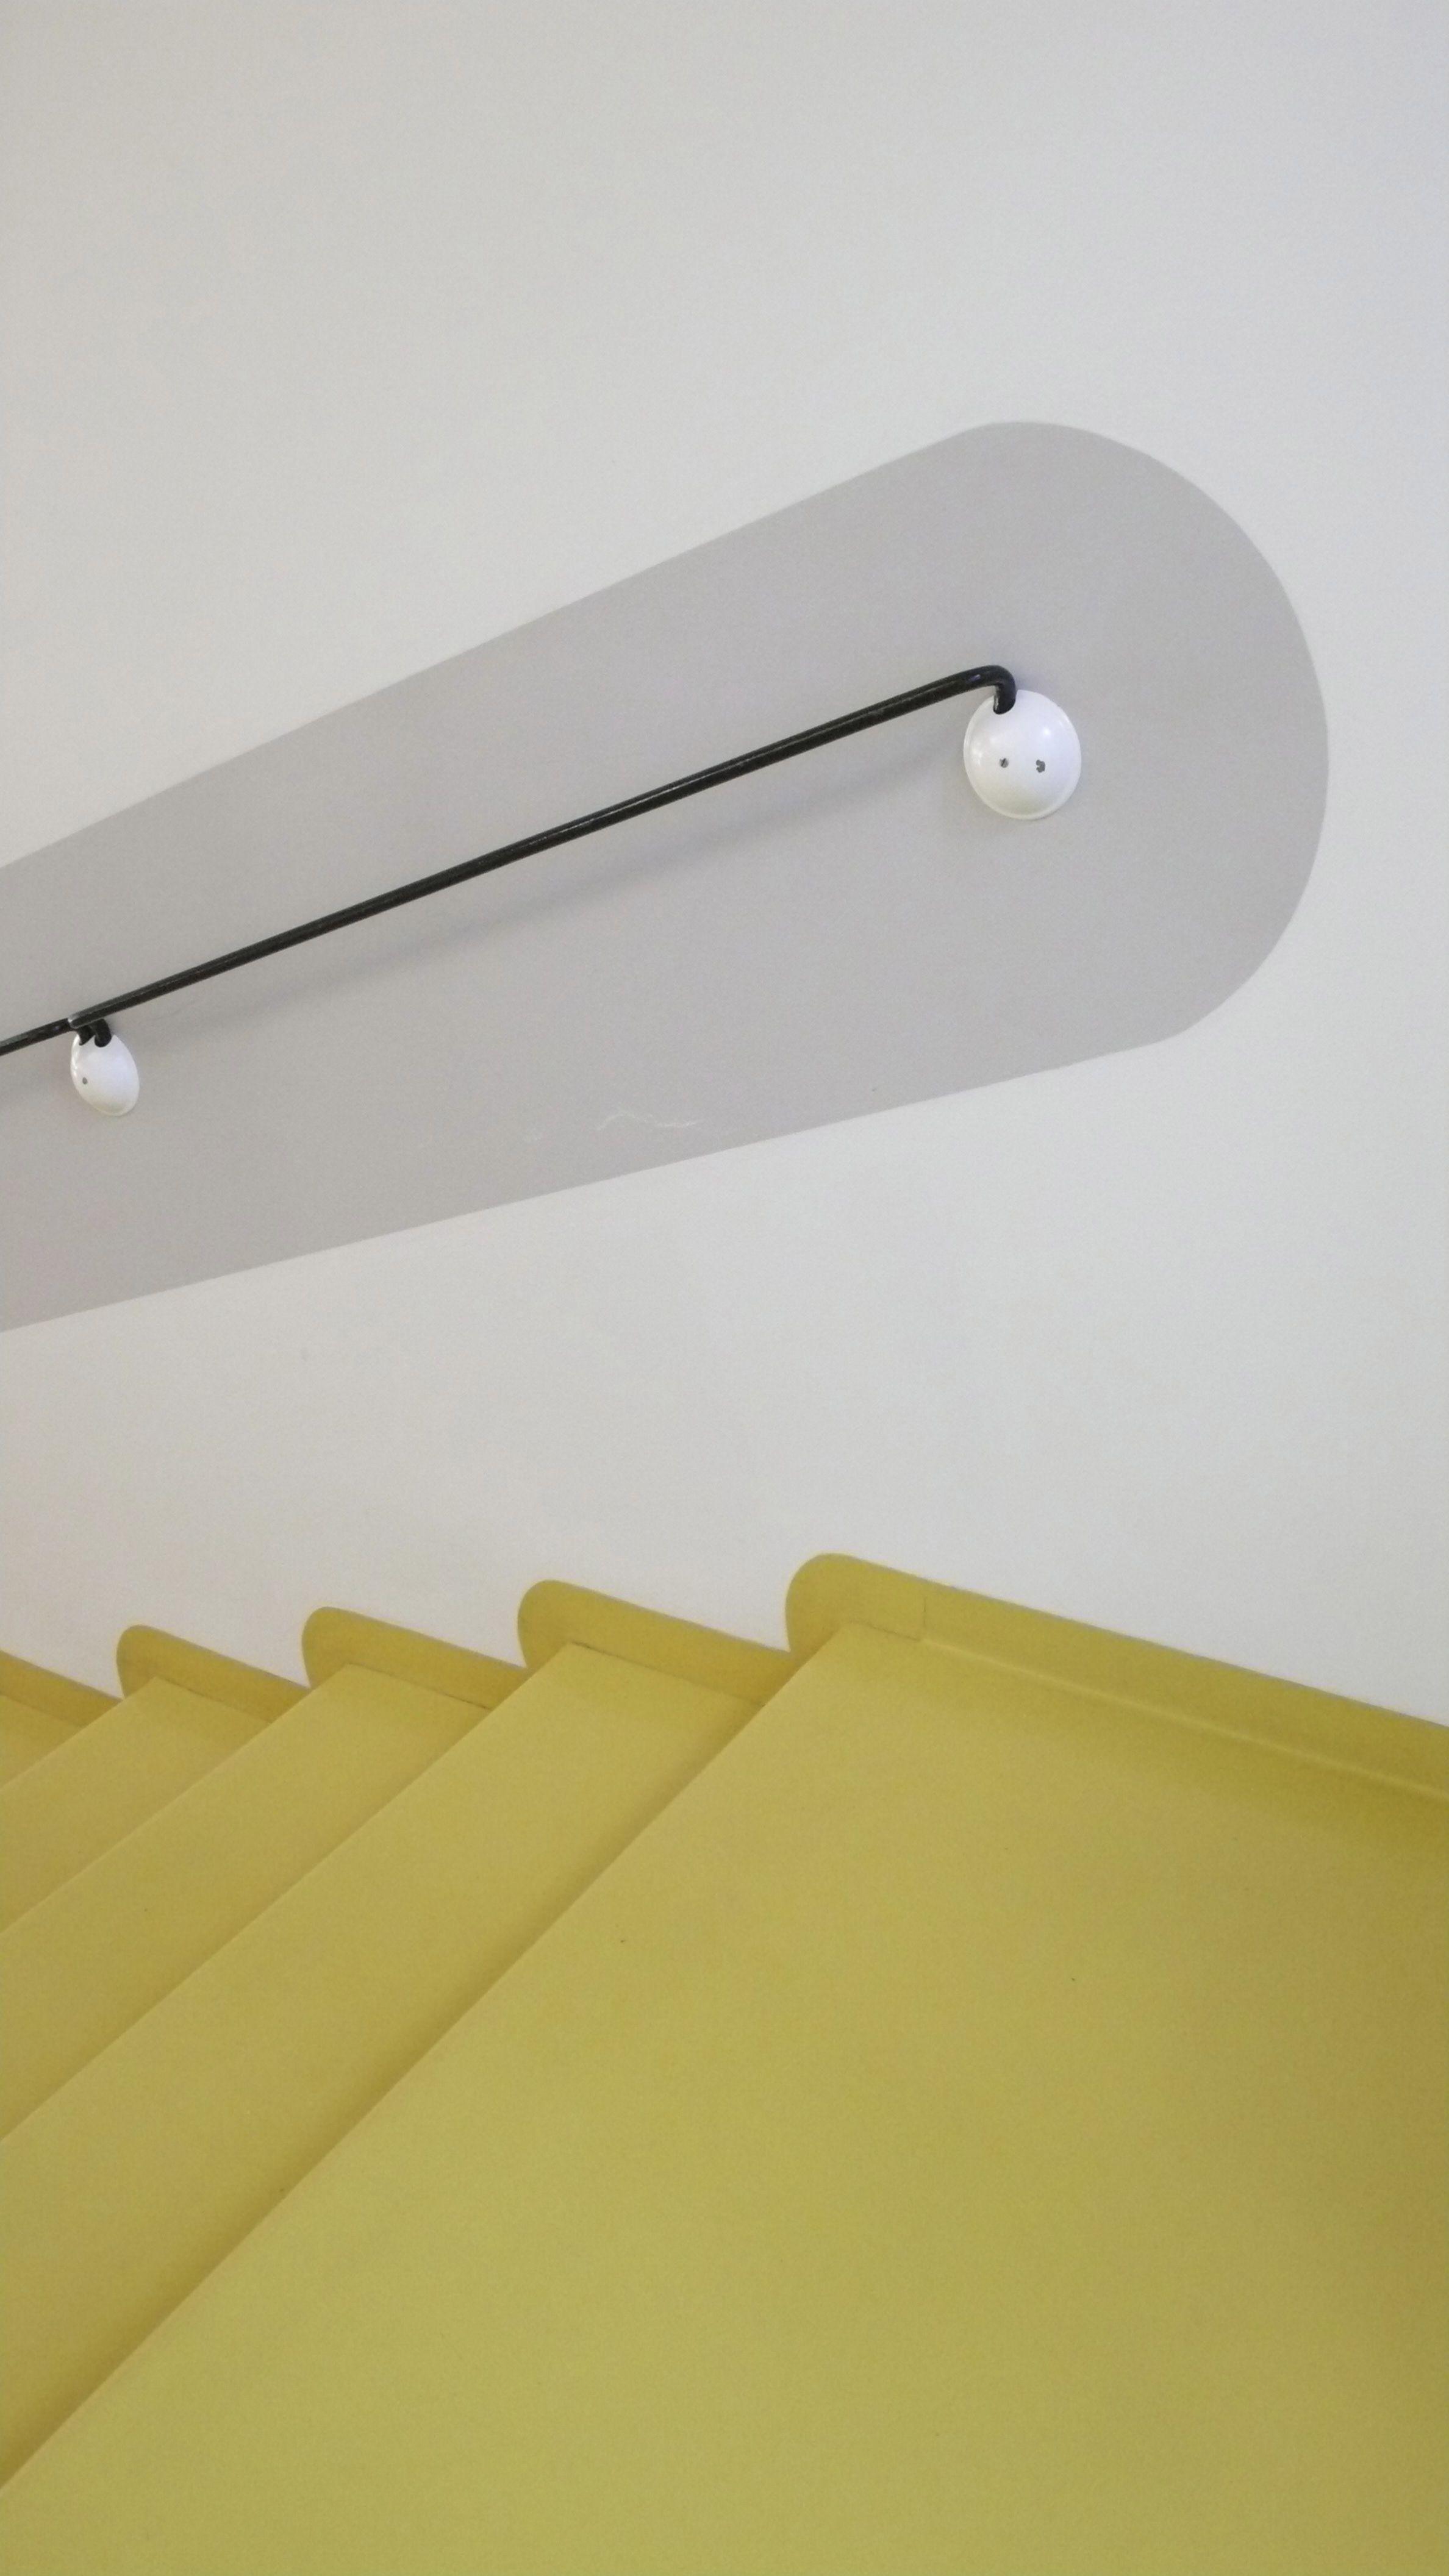 Pin By Jo Helm On Wooninspiratie | Pinterest | Flooring, Stairs And Linoleum  Flooring